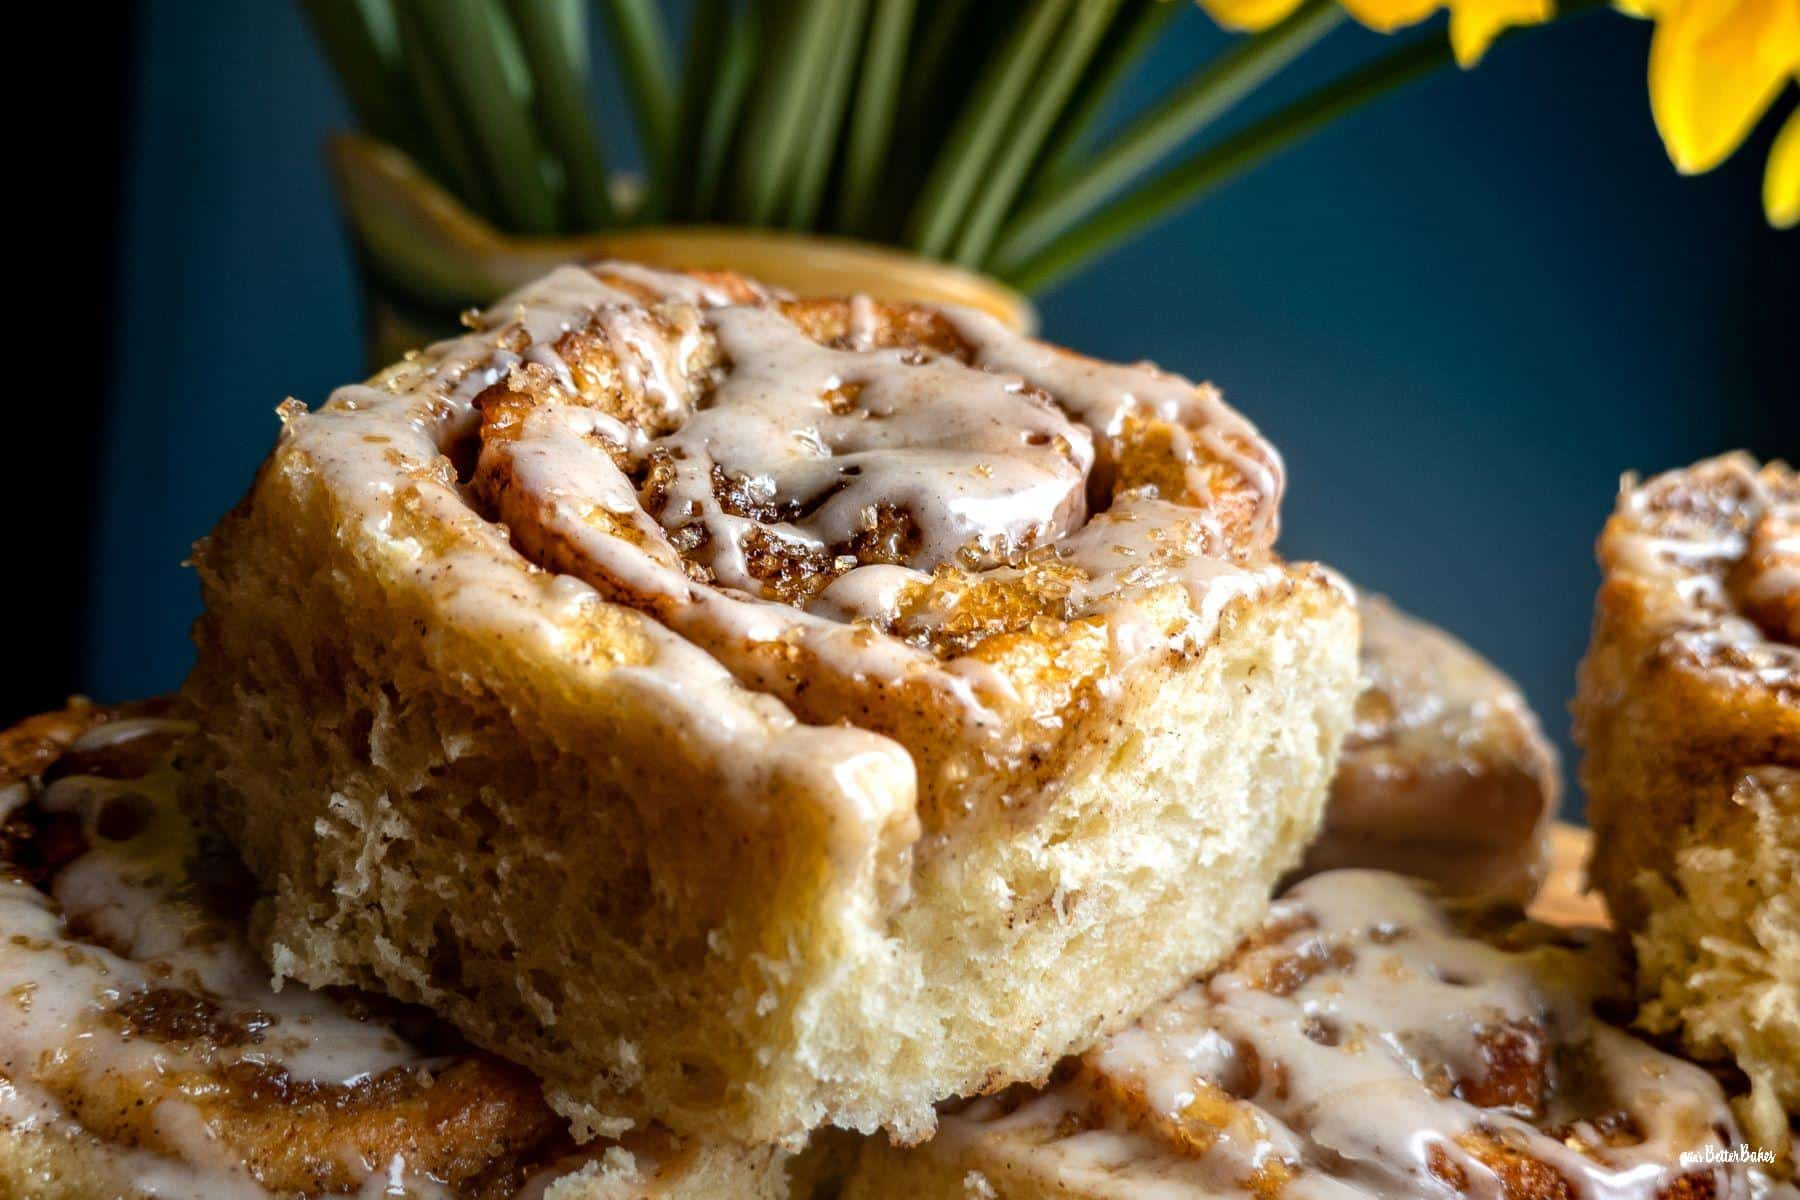 close up of one cinnamon bun